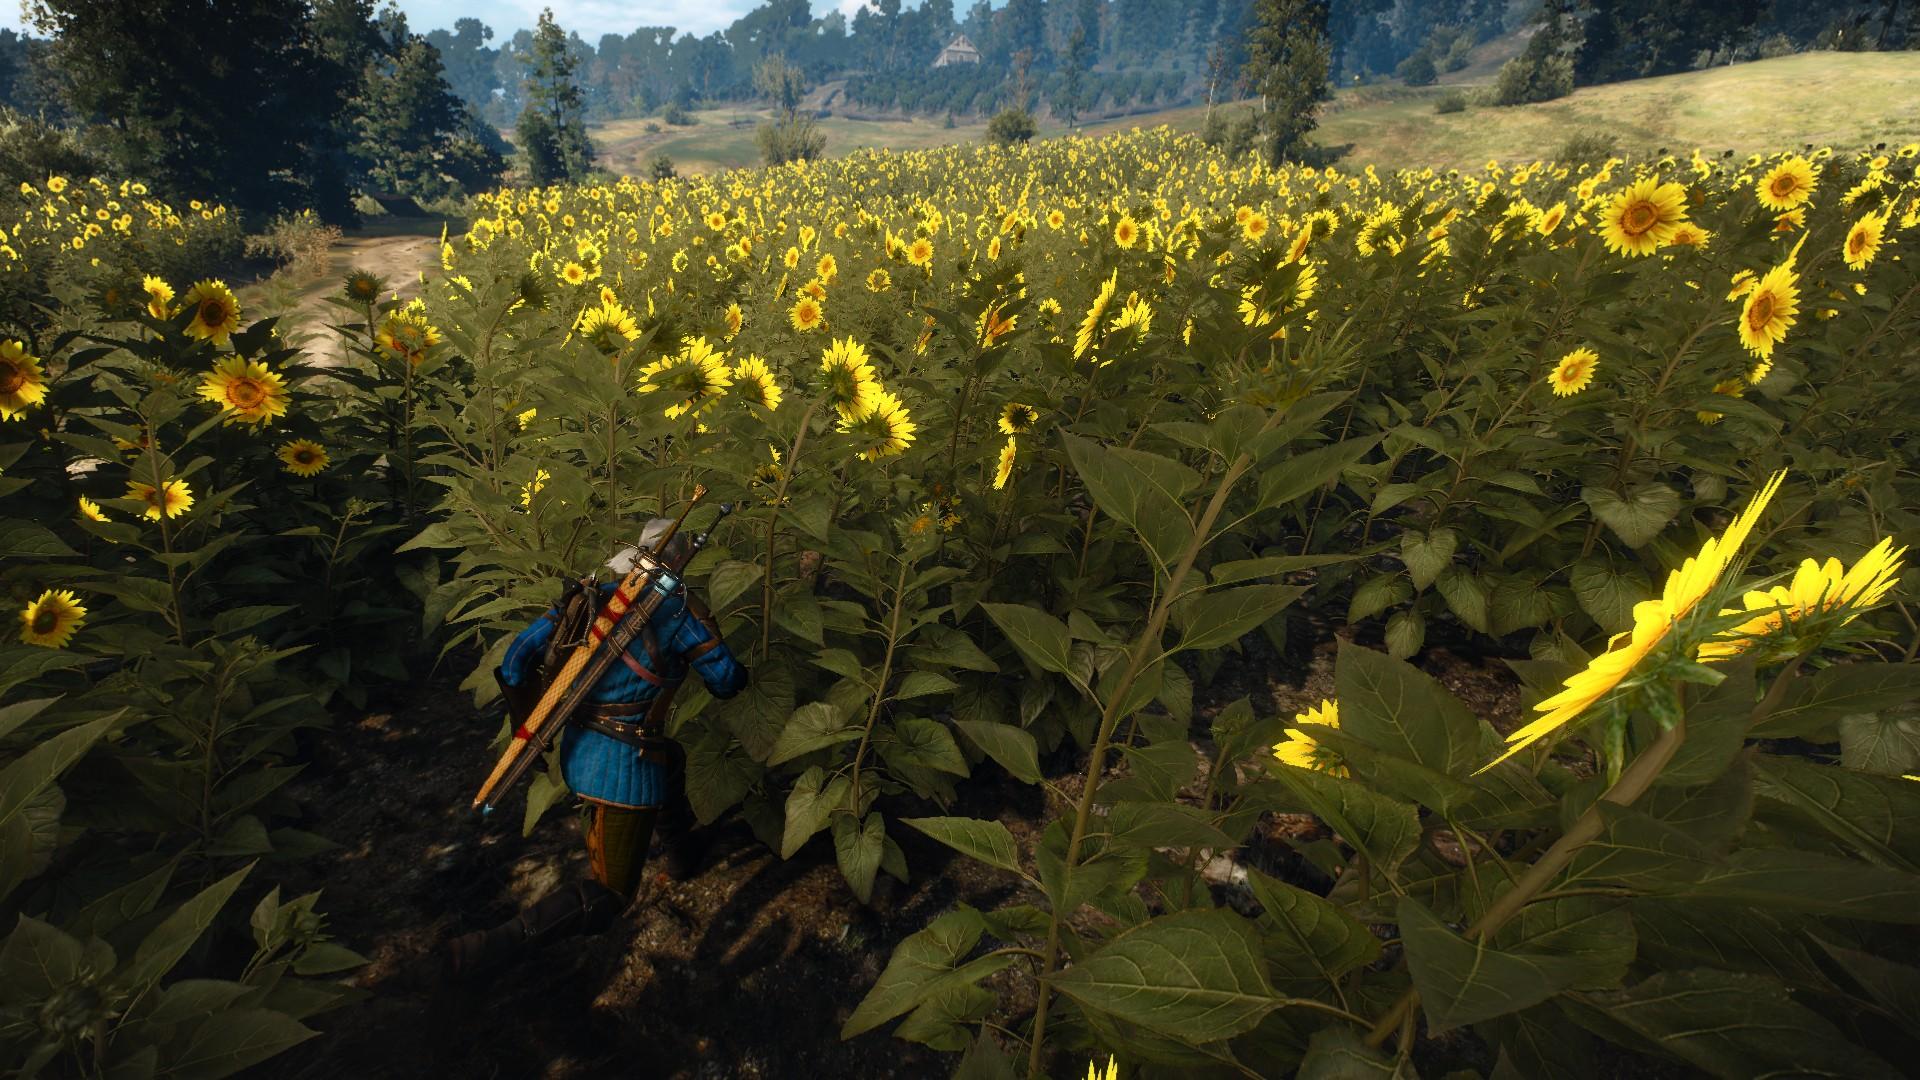 The Witcher 3 Screenshot 2019.02.08 - 01.39.29.18.jpg - Witcher 3: Wild Hunt, the